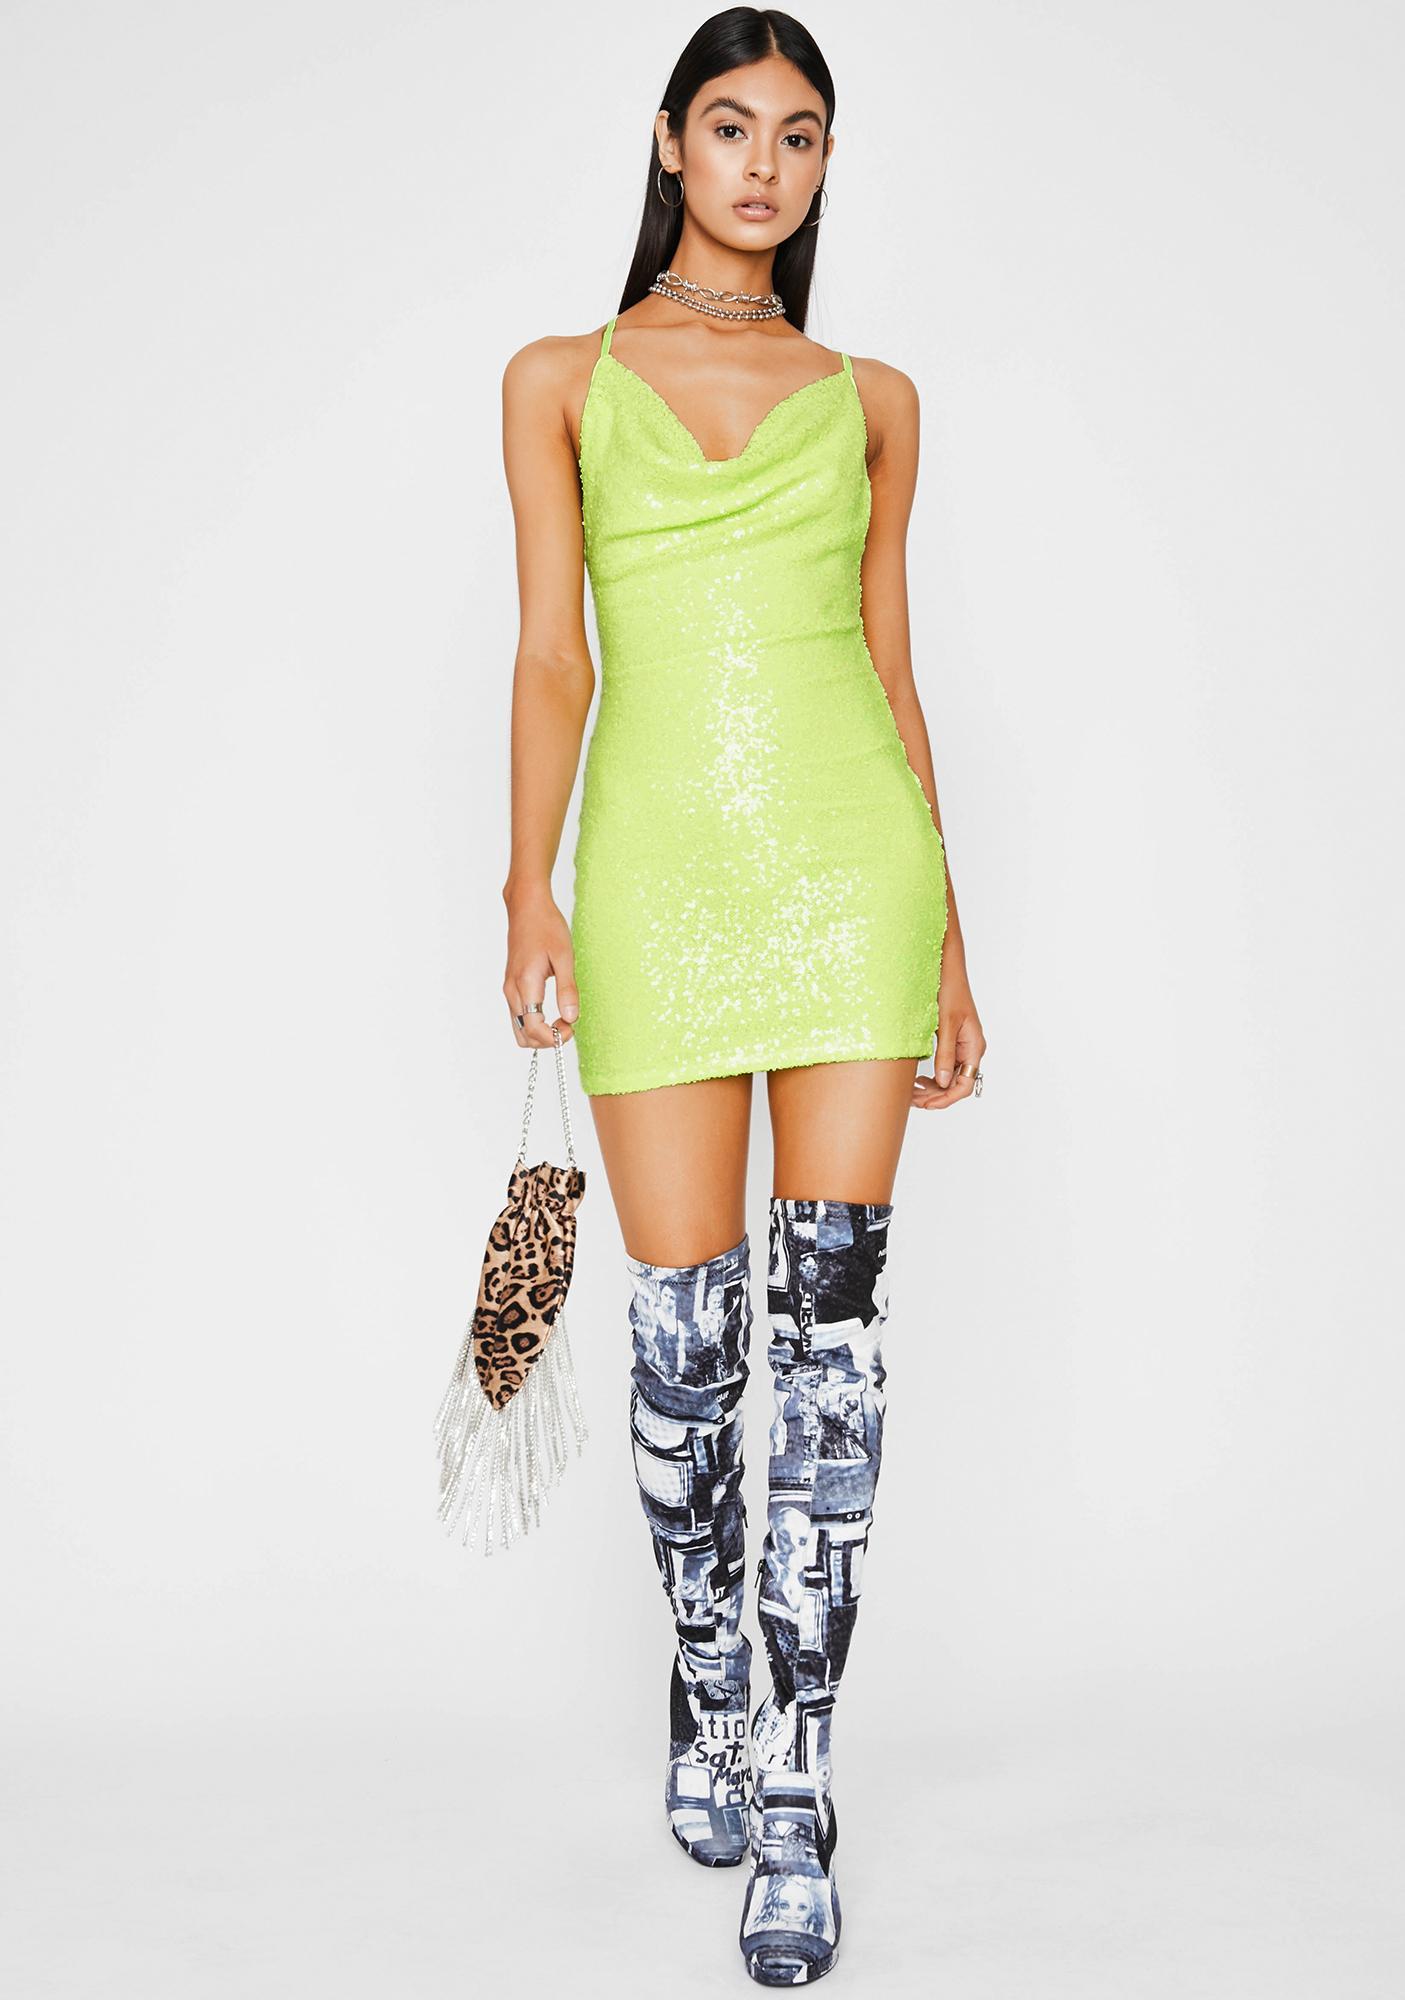 Atomic Spendin' Coins Mini Dress